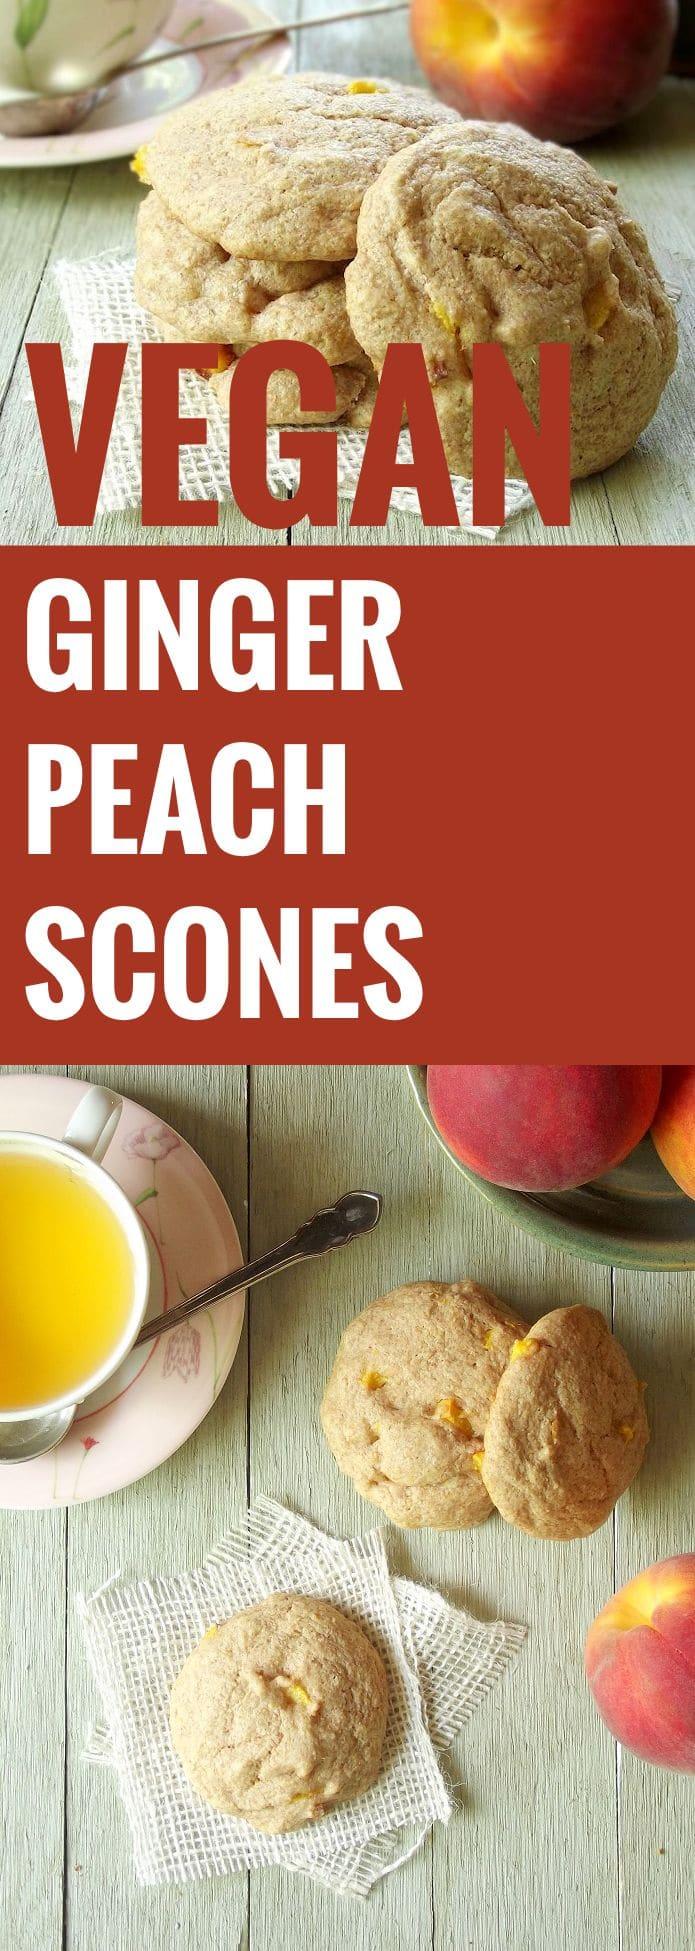 ginger-peach-scones-long